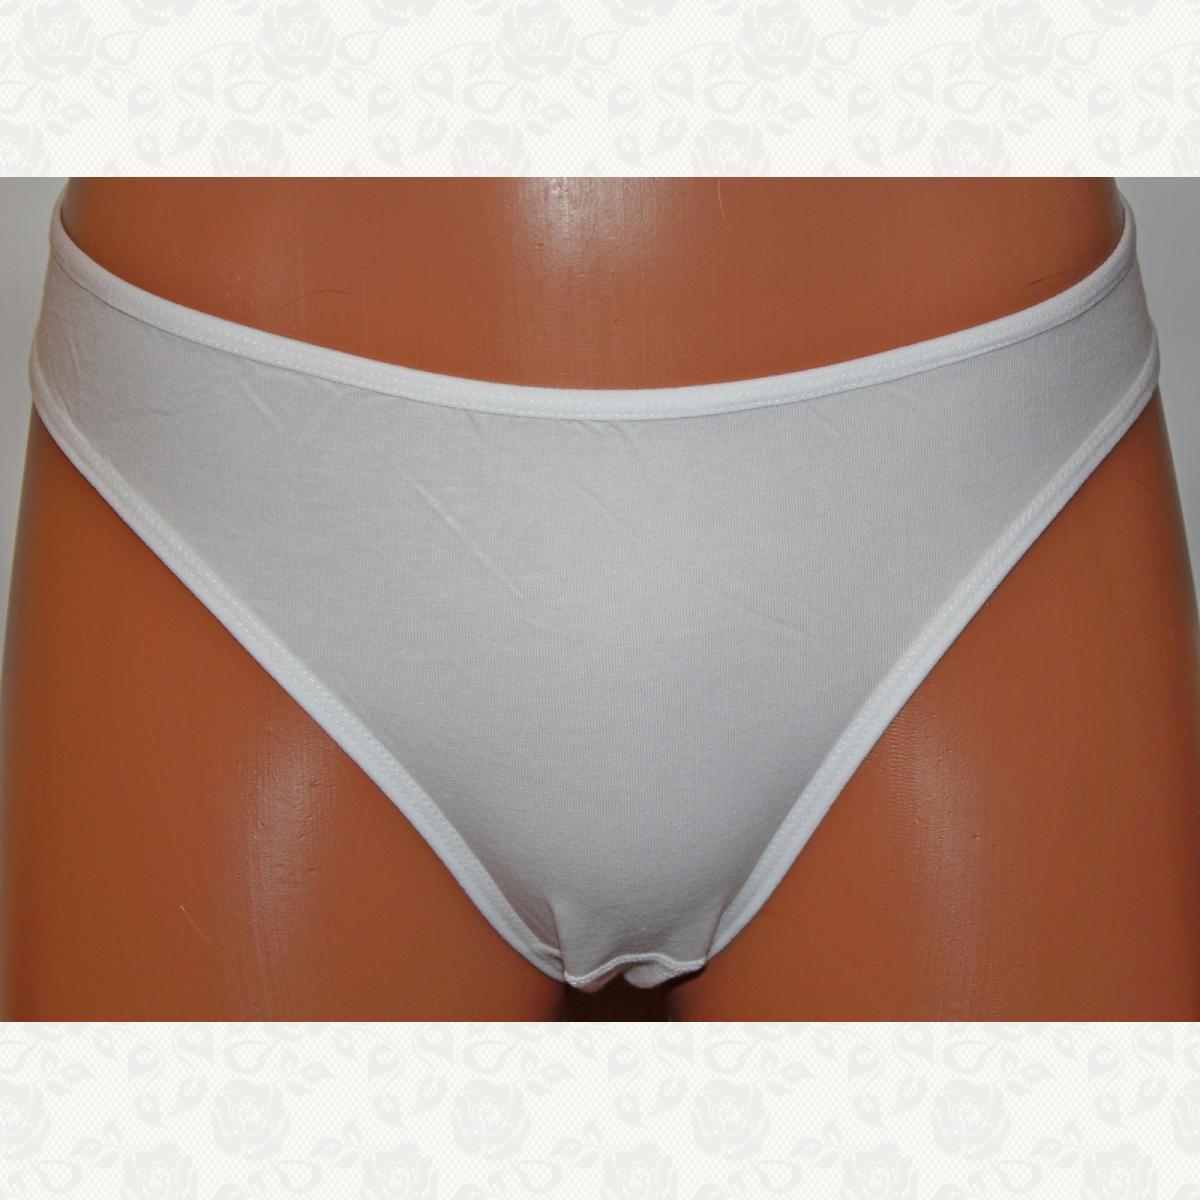 Трусики женские полубатал, цвет белый, 10 шт.